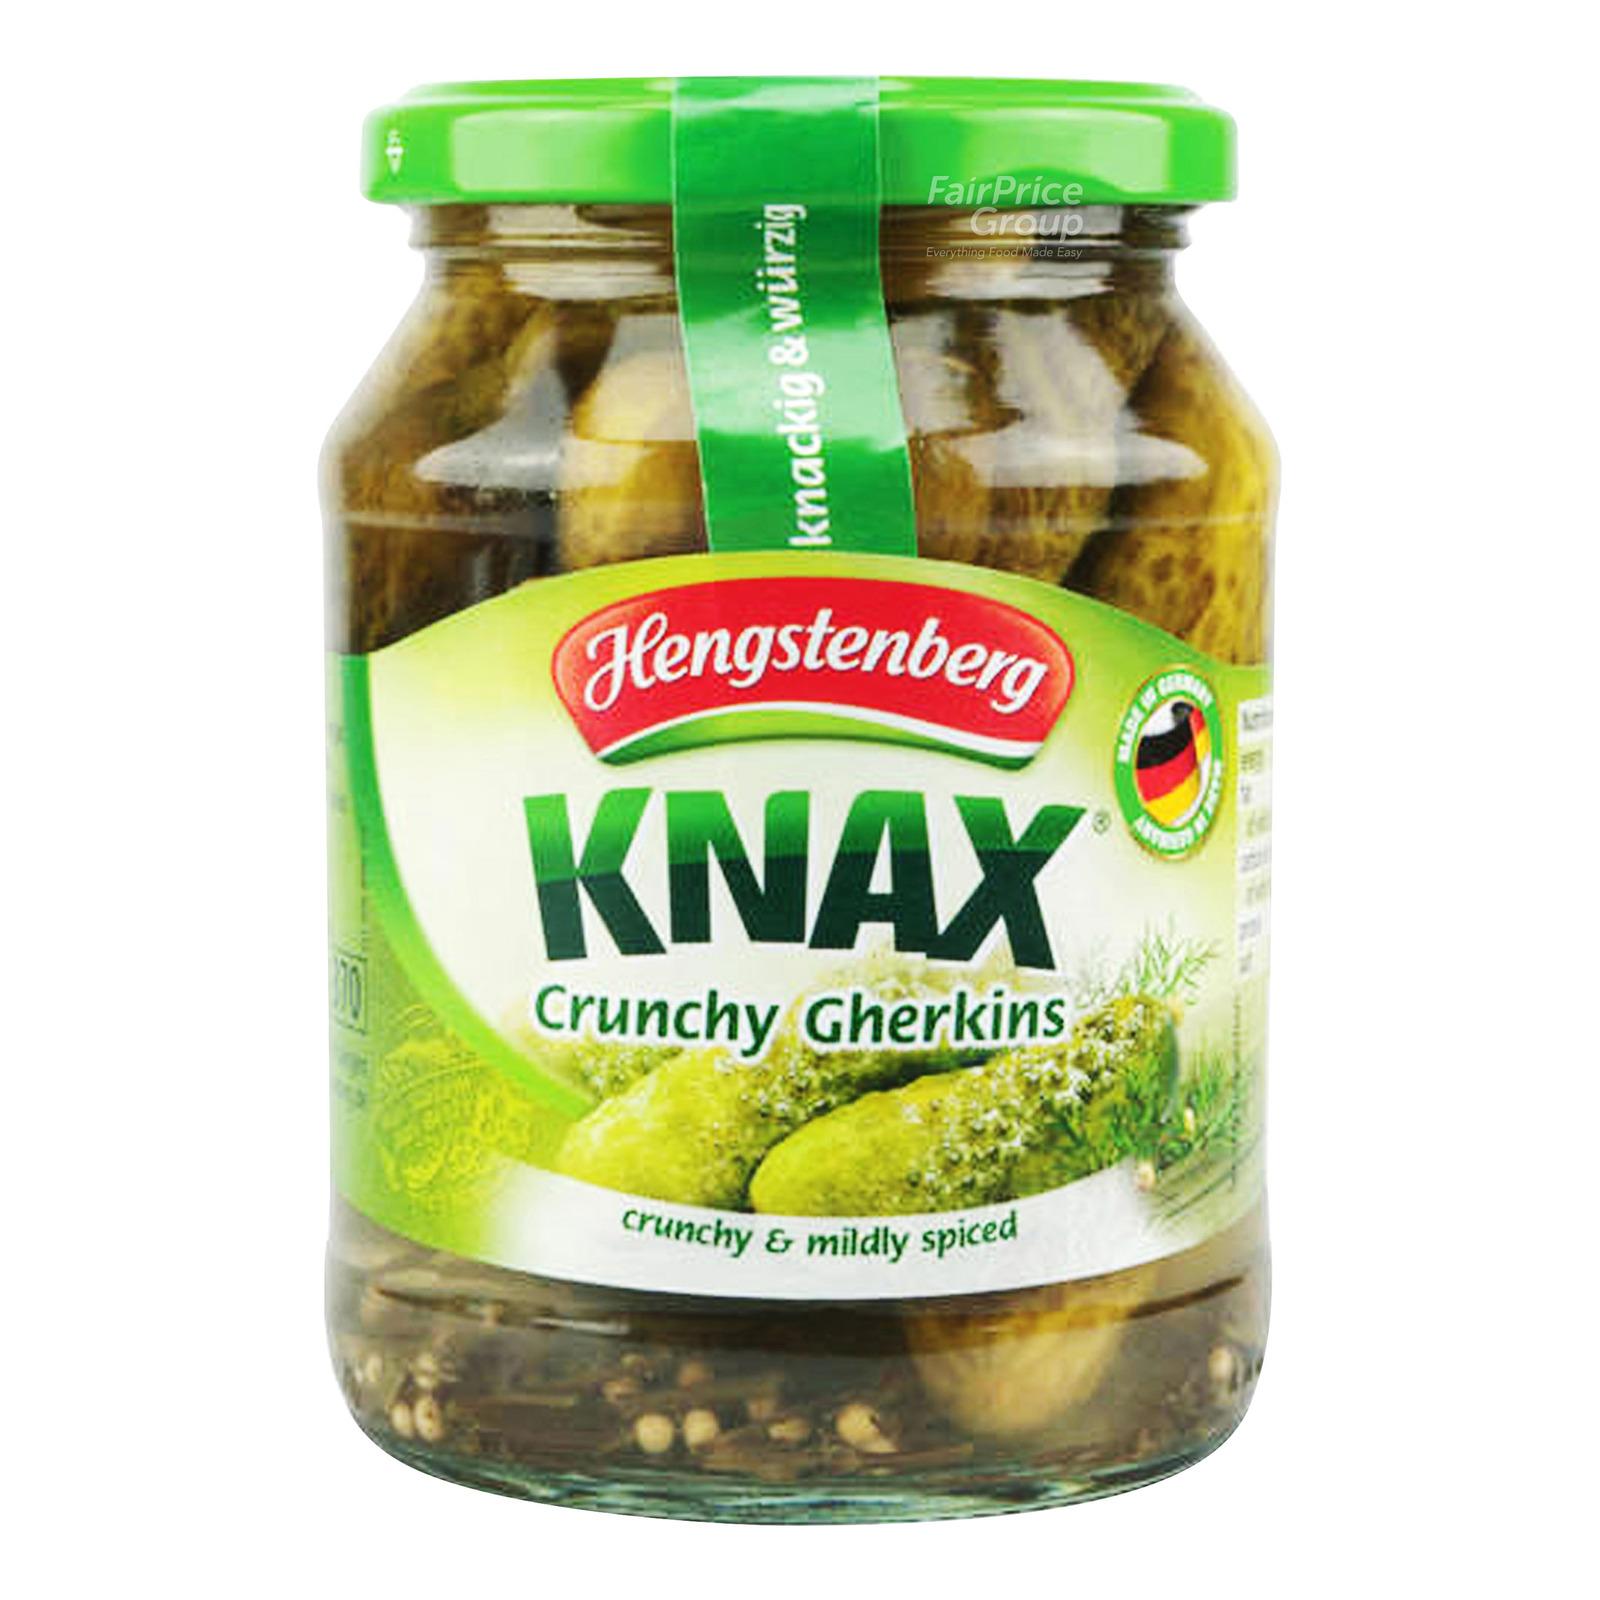 Hengstenberg Knax Crunchy Gherkins - Mildly Spiced